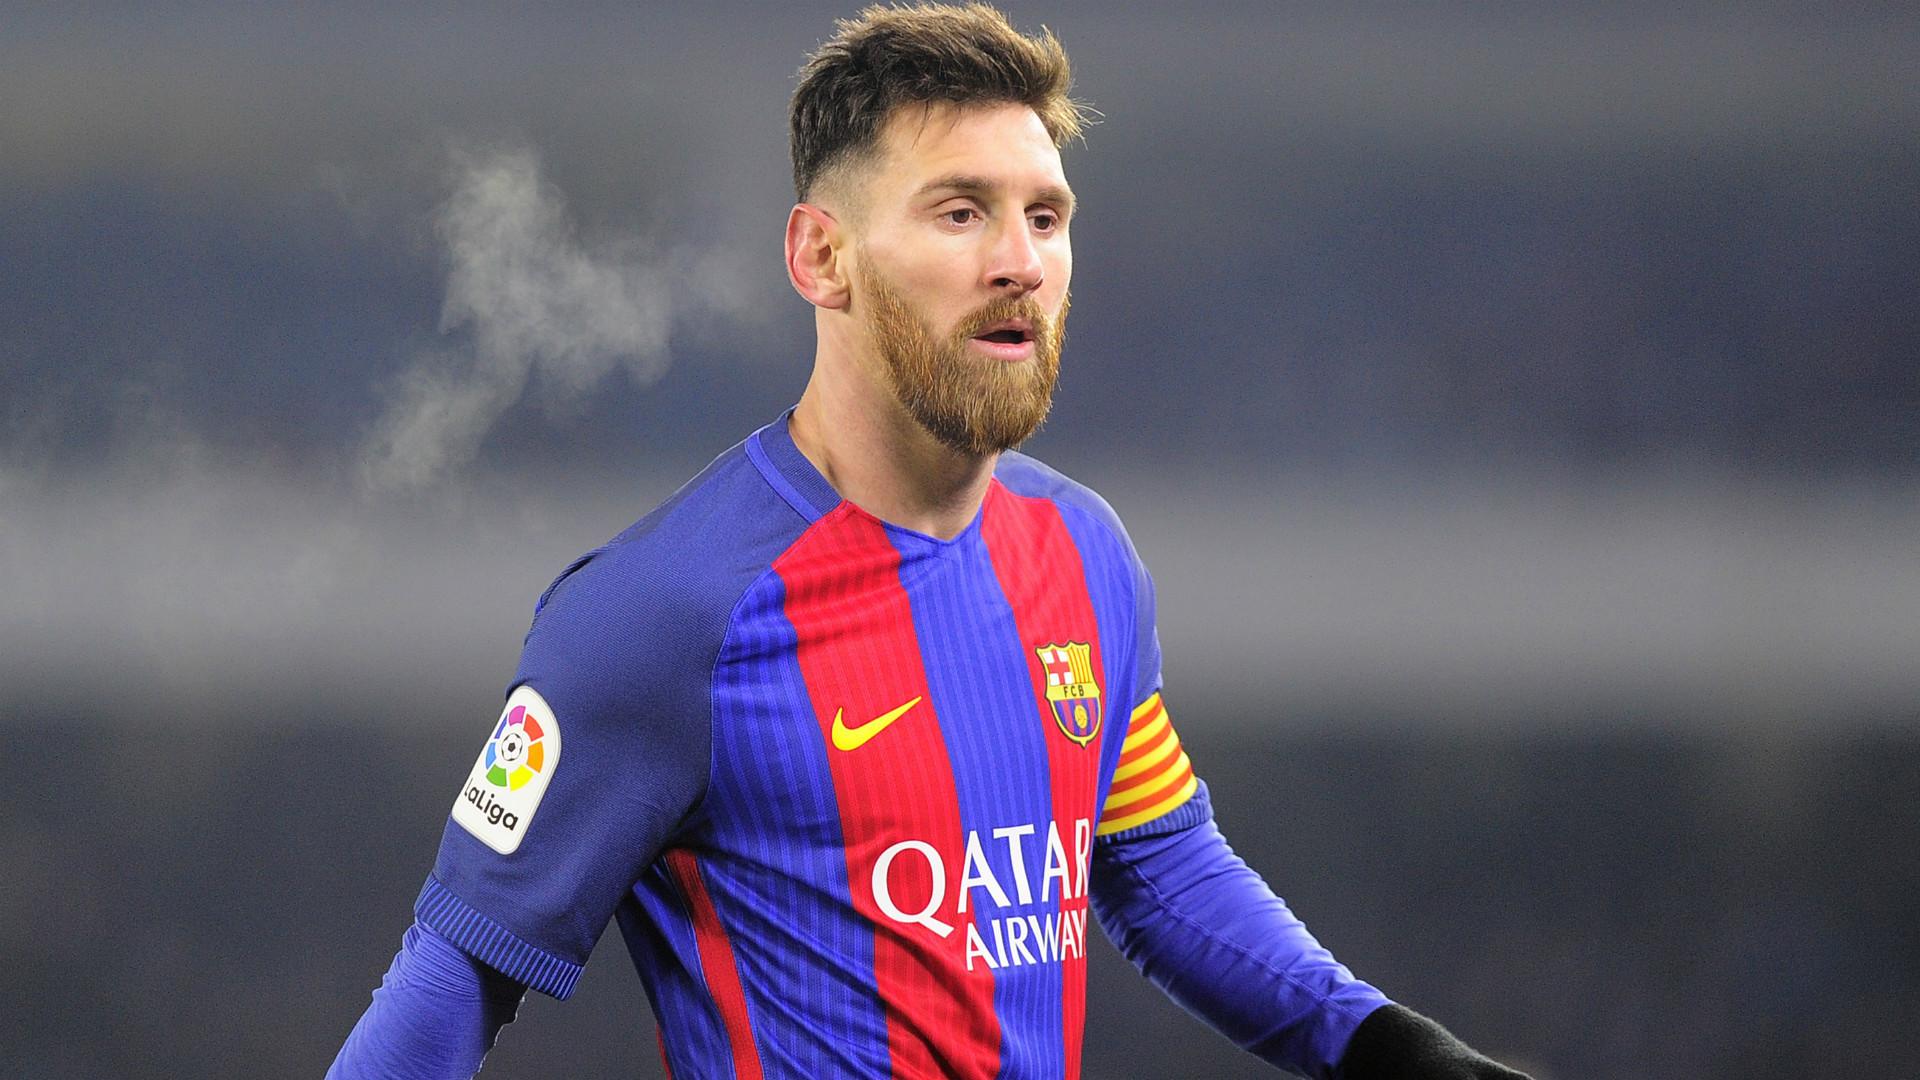 Lionel Messi Wallpaper 2018 70 Pictures